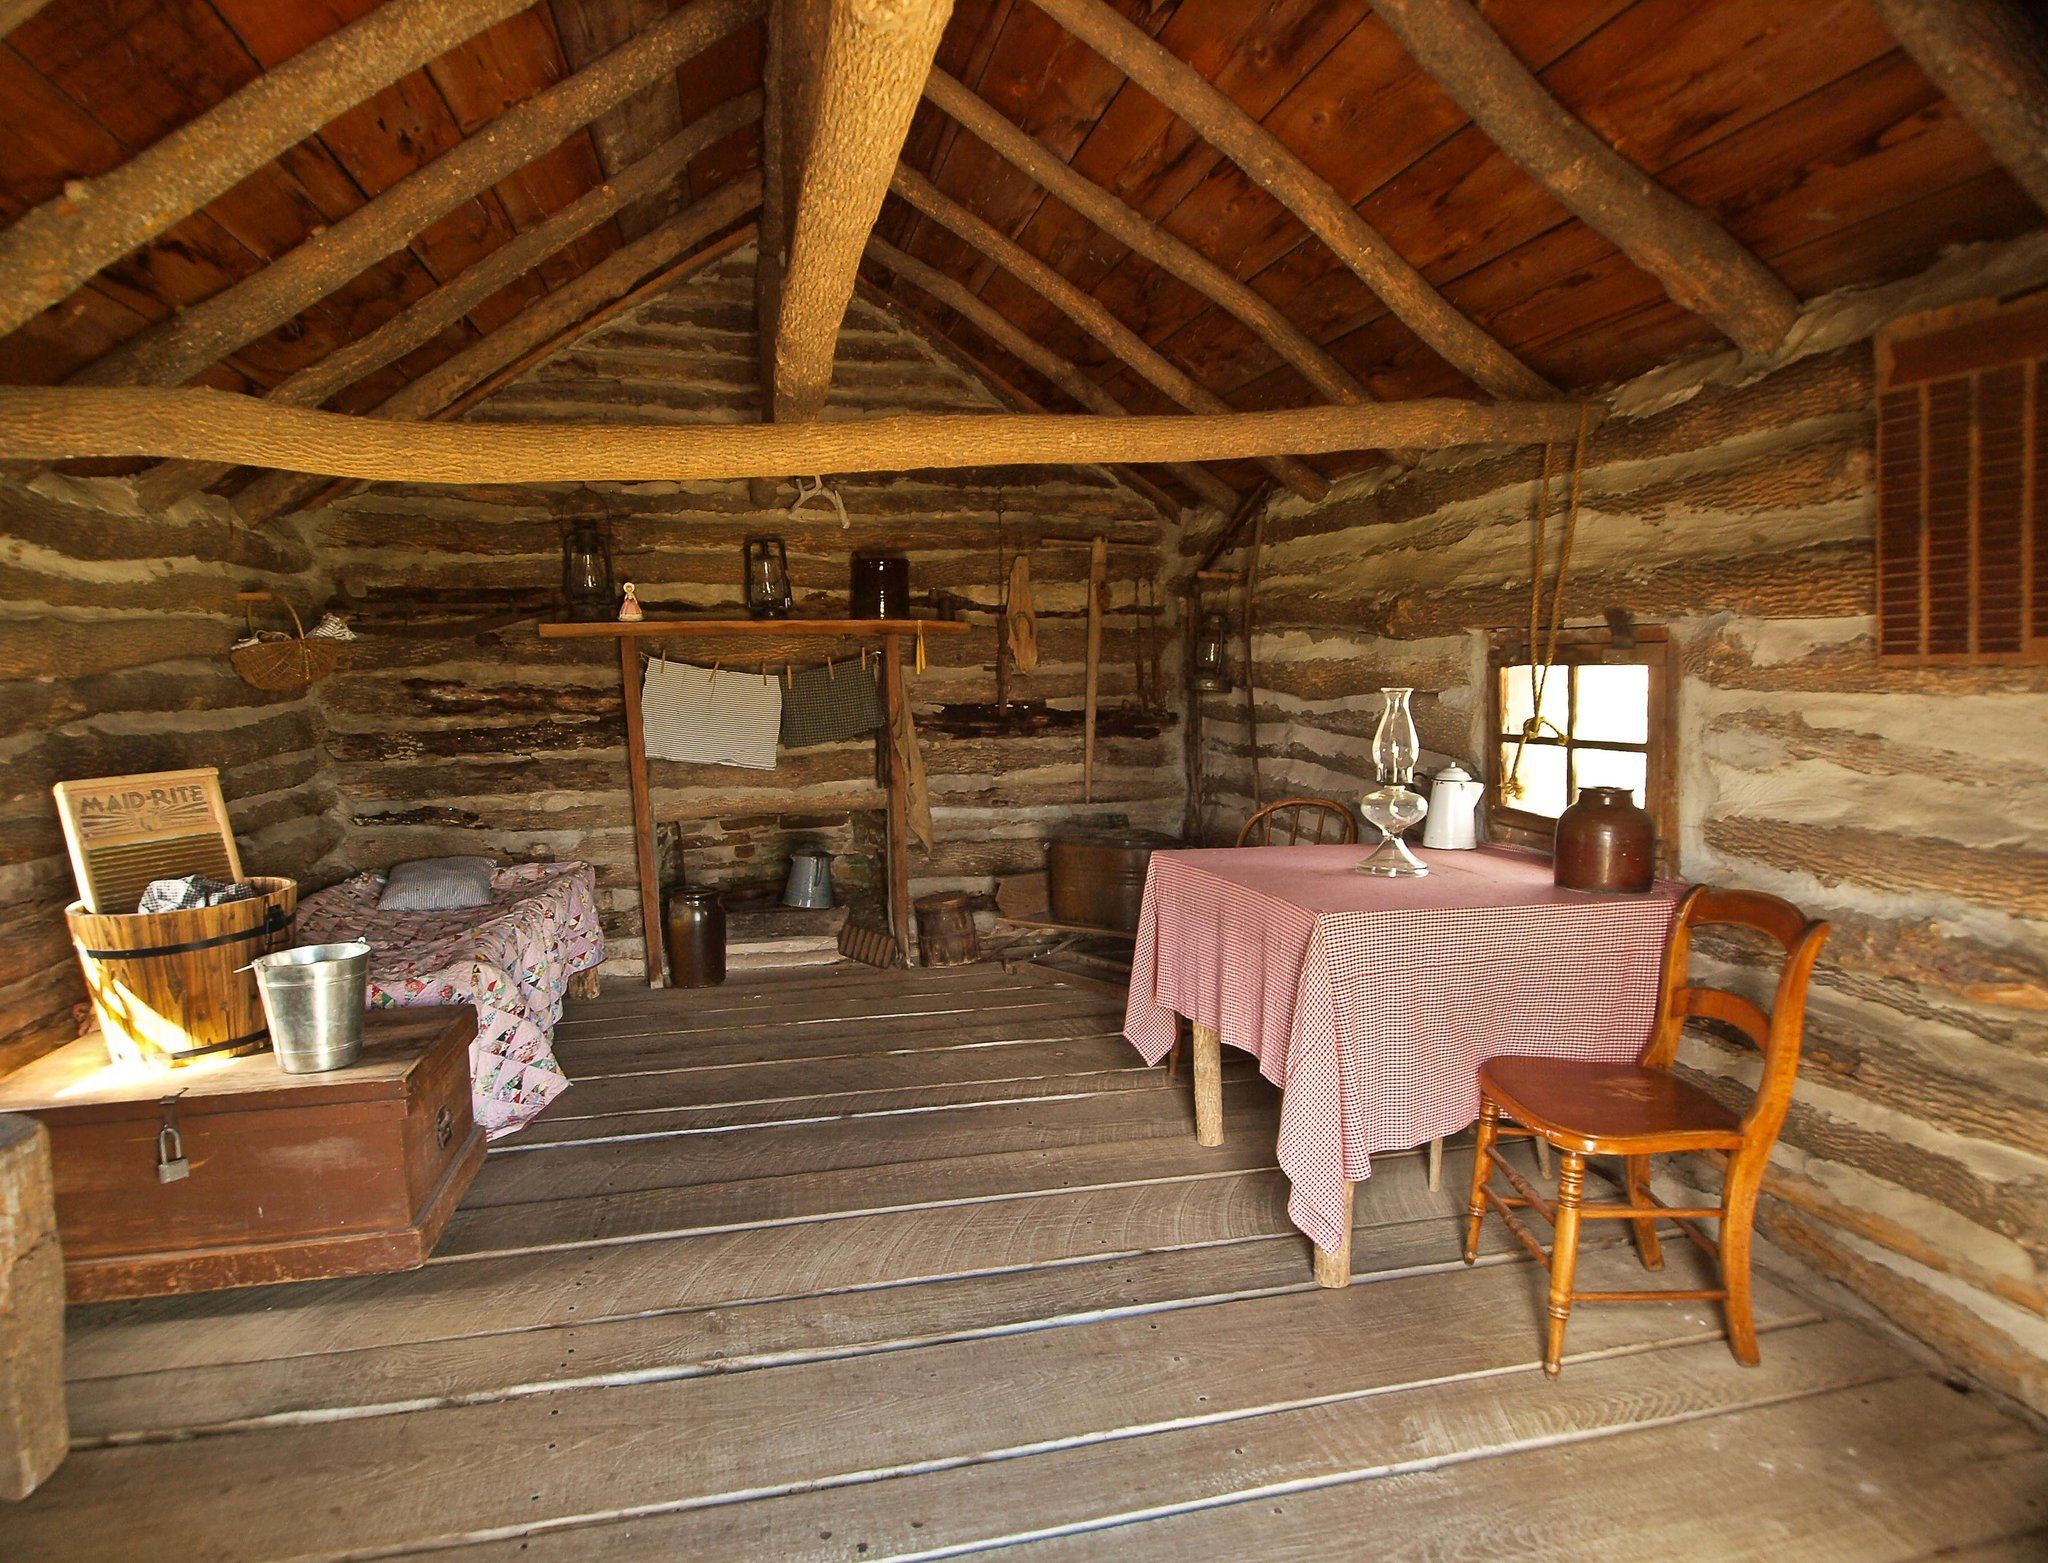 Woods Lumber Independence Ks ~ Little house on the prairie museum independence ks